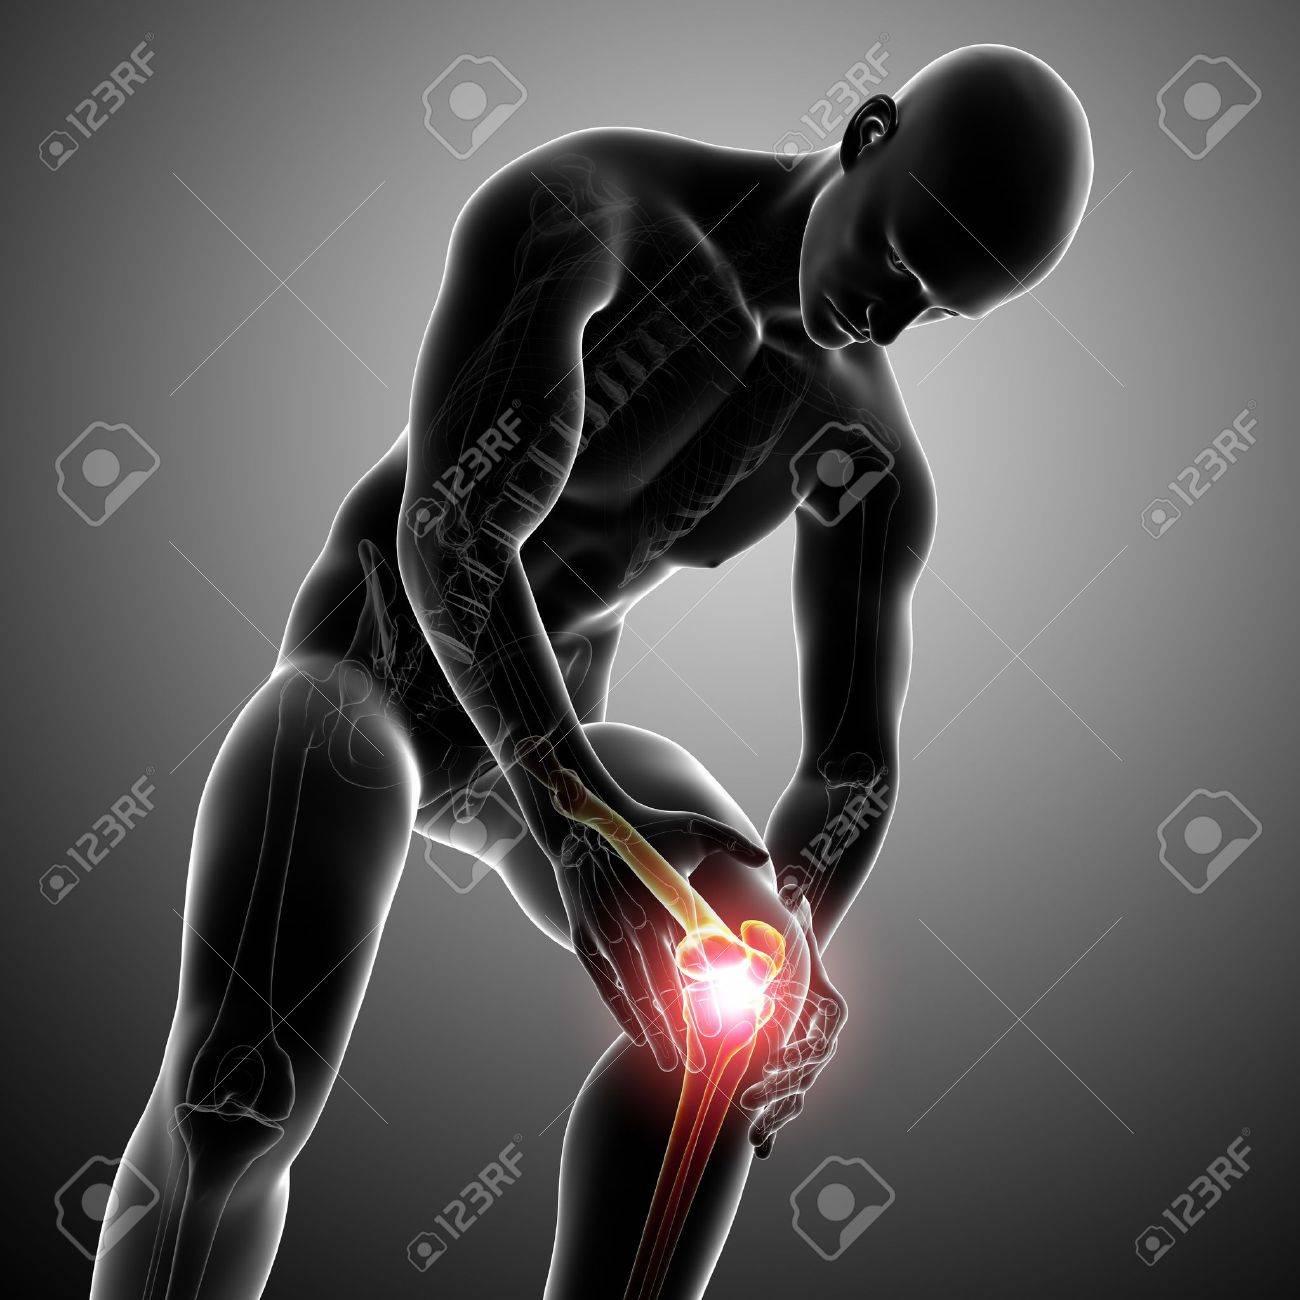 Anatomy of male knee pain in gray Stock Photo - 13757775